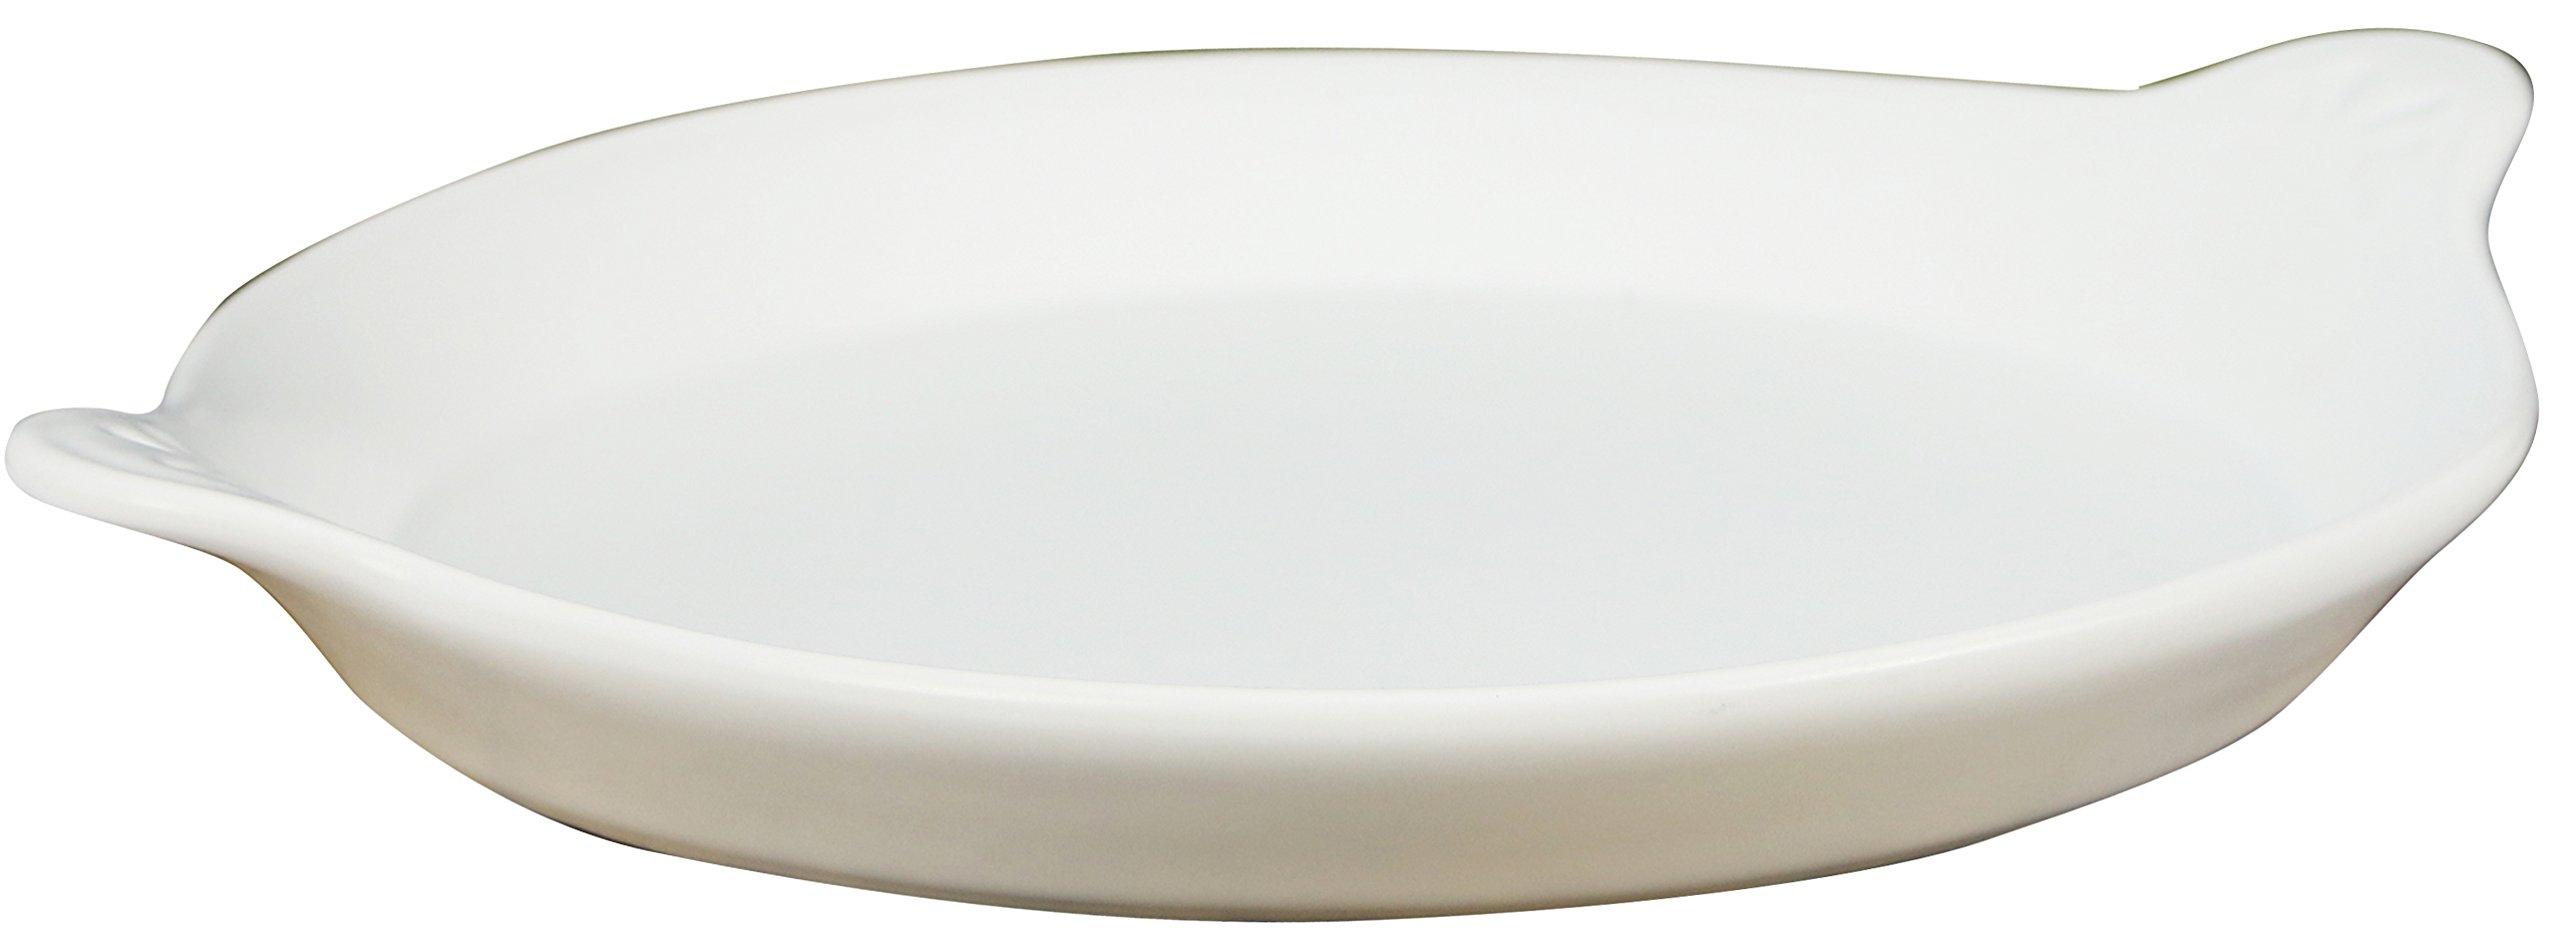 Eurita by Reston Lloyd Flame Safe Au Gratin Porcelain Pan, Large, White by Reston Lloyd (Image #1)